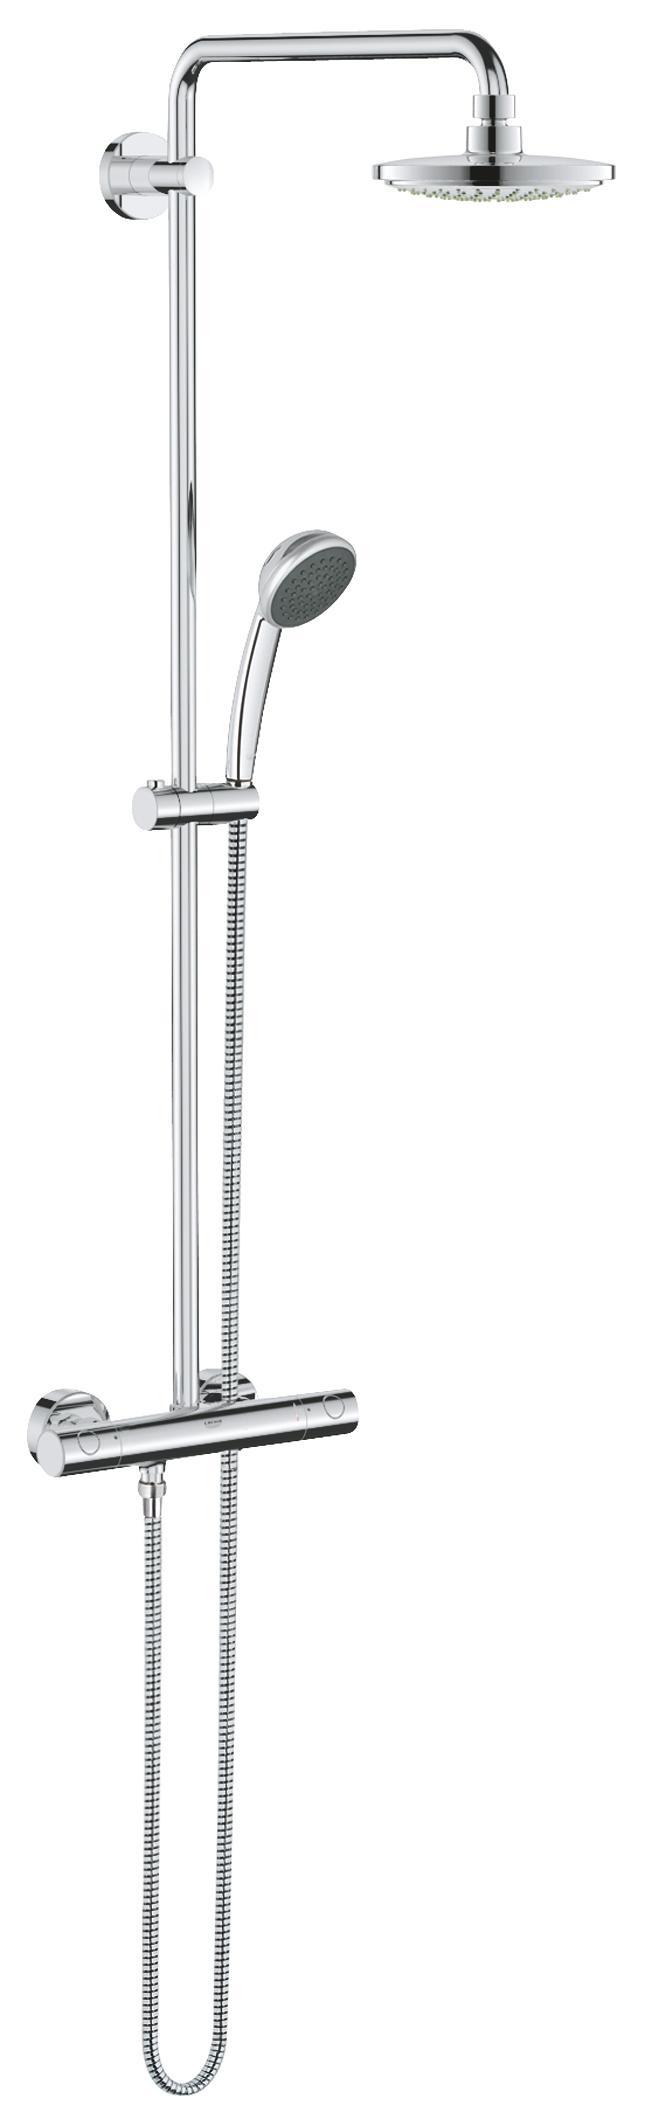 grohe 27298001 vitalio joy 180 shower system 3 sprays diy tools. Black Bedroom Furniture Sets. Home Design Ideas